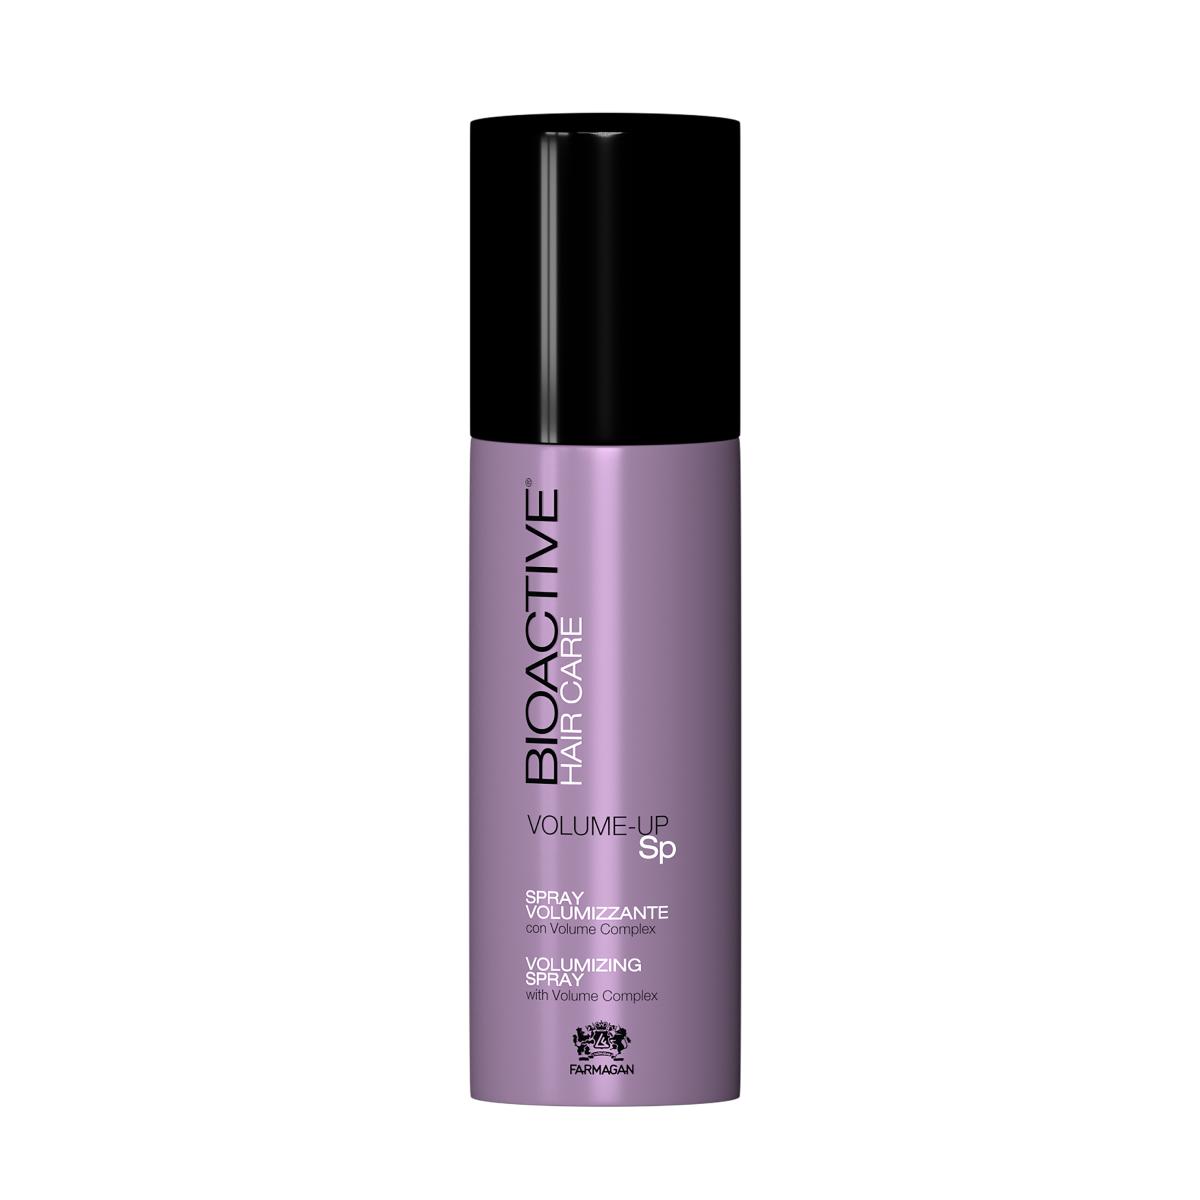 BIOACTIVE Hair Care Spray do włosów, Spray, Uroda